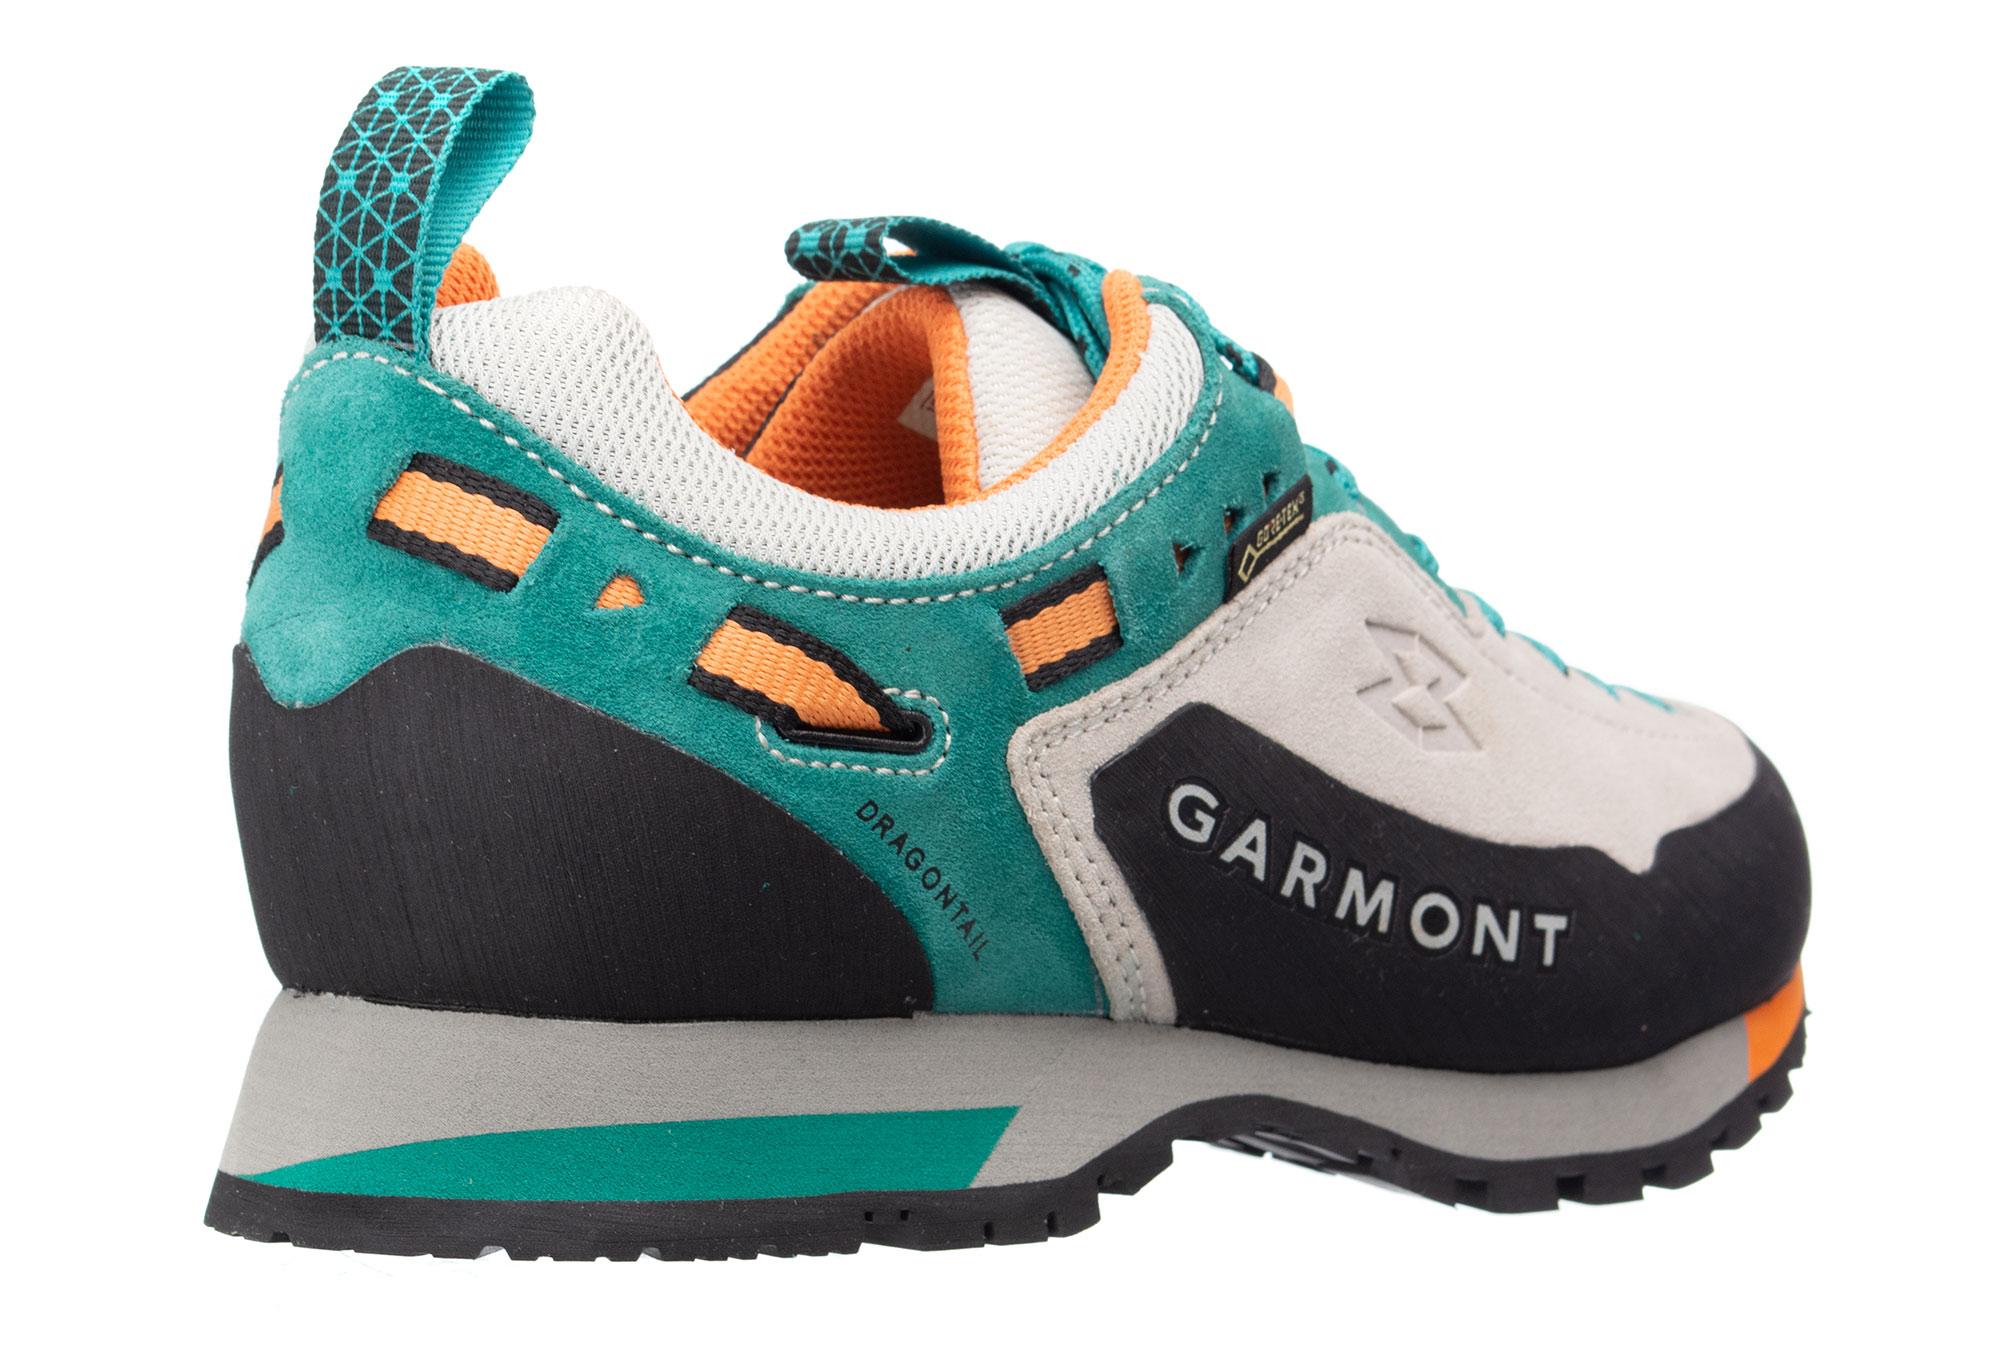 Garmont Dragontail Lt M Chaussures montantes unisex